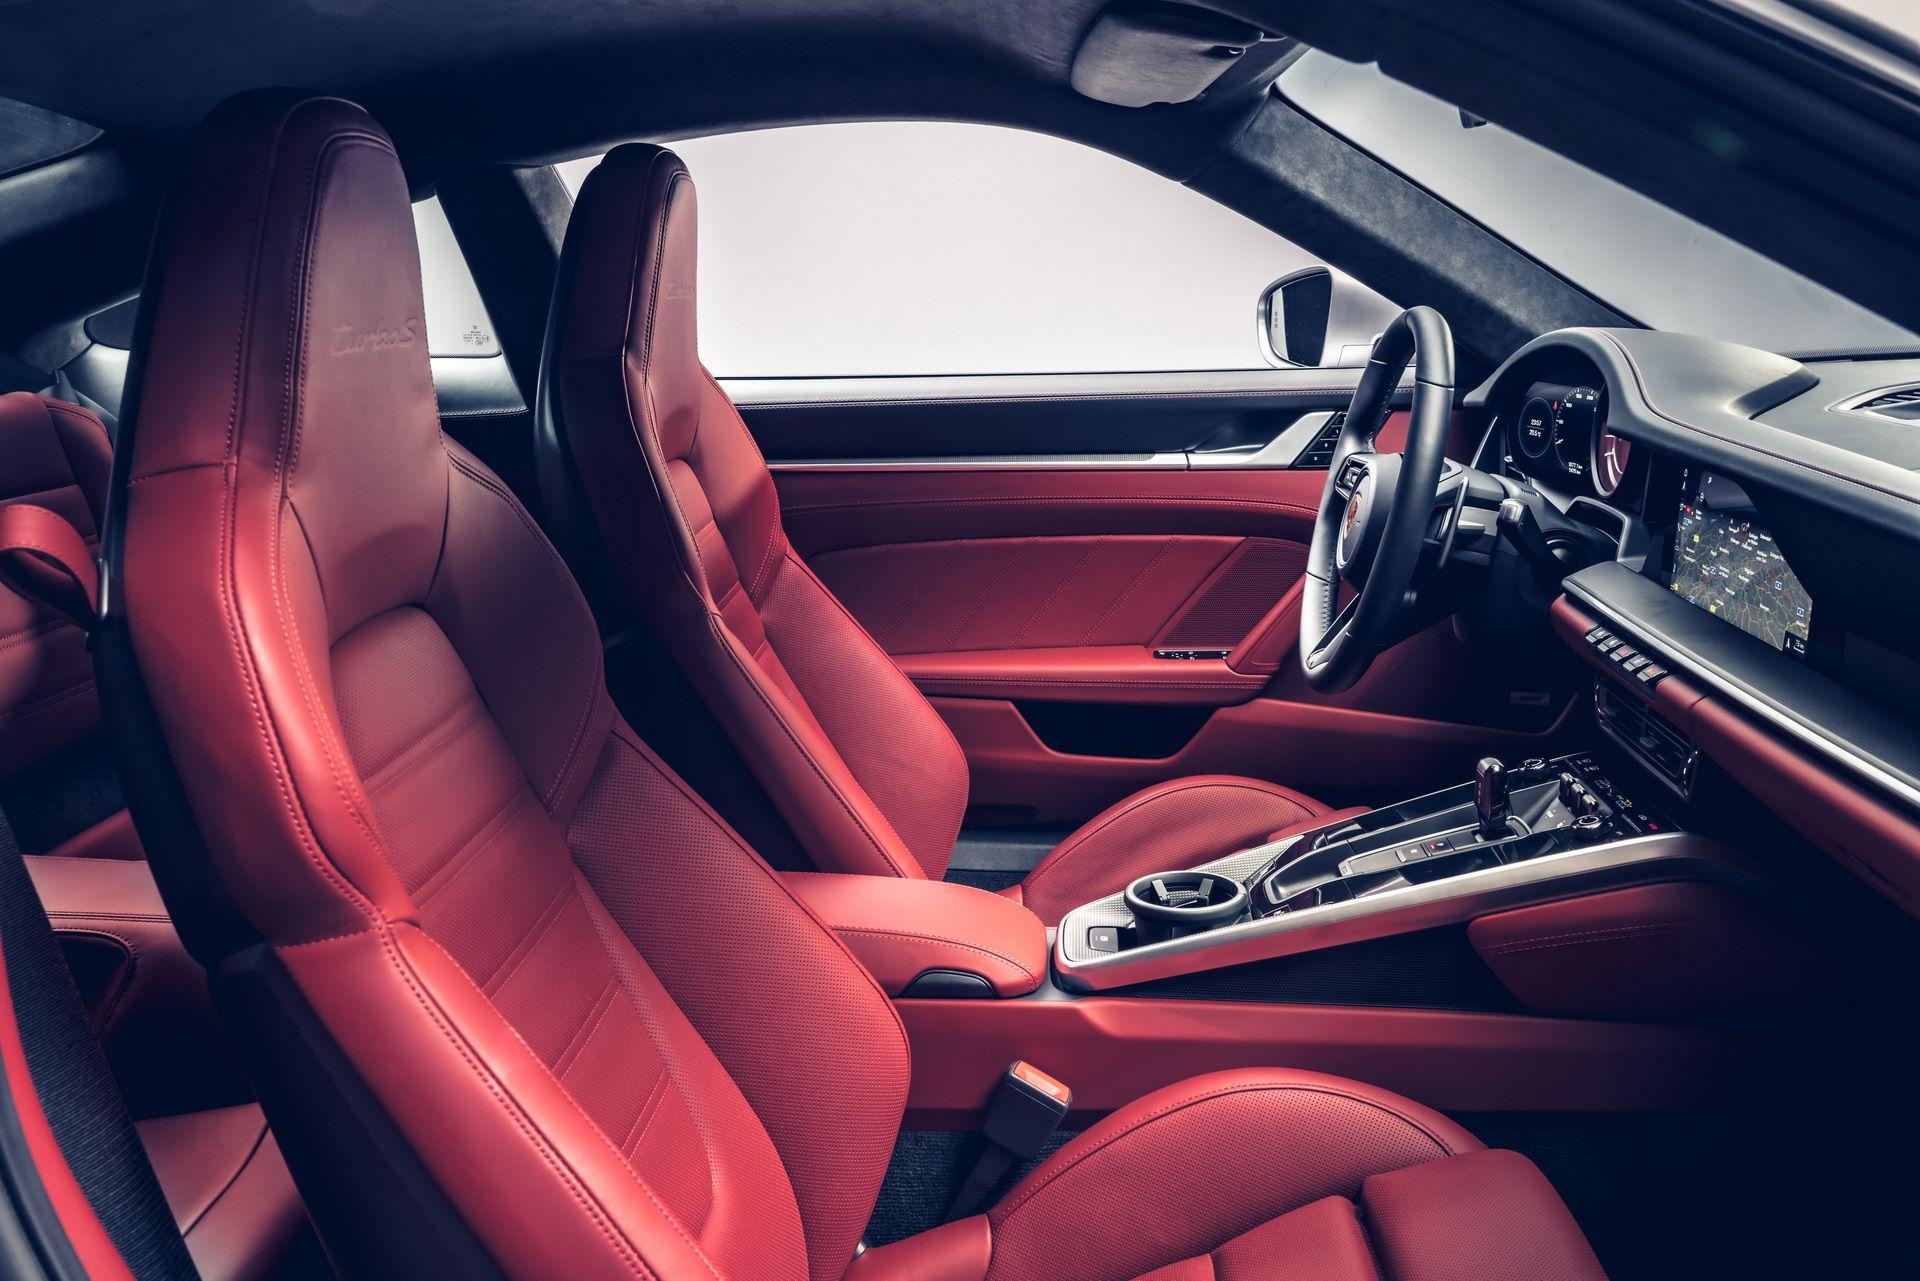 Porsche-911-Turbo-S-2020-26